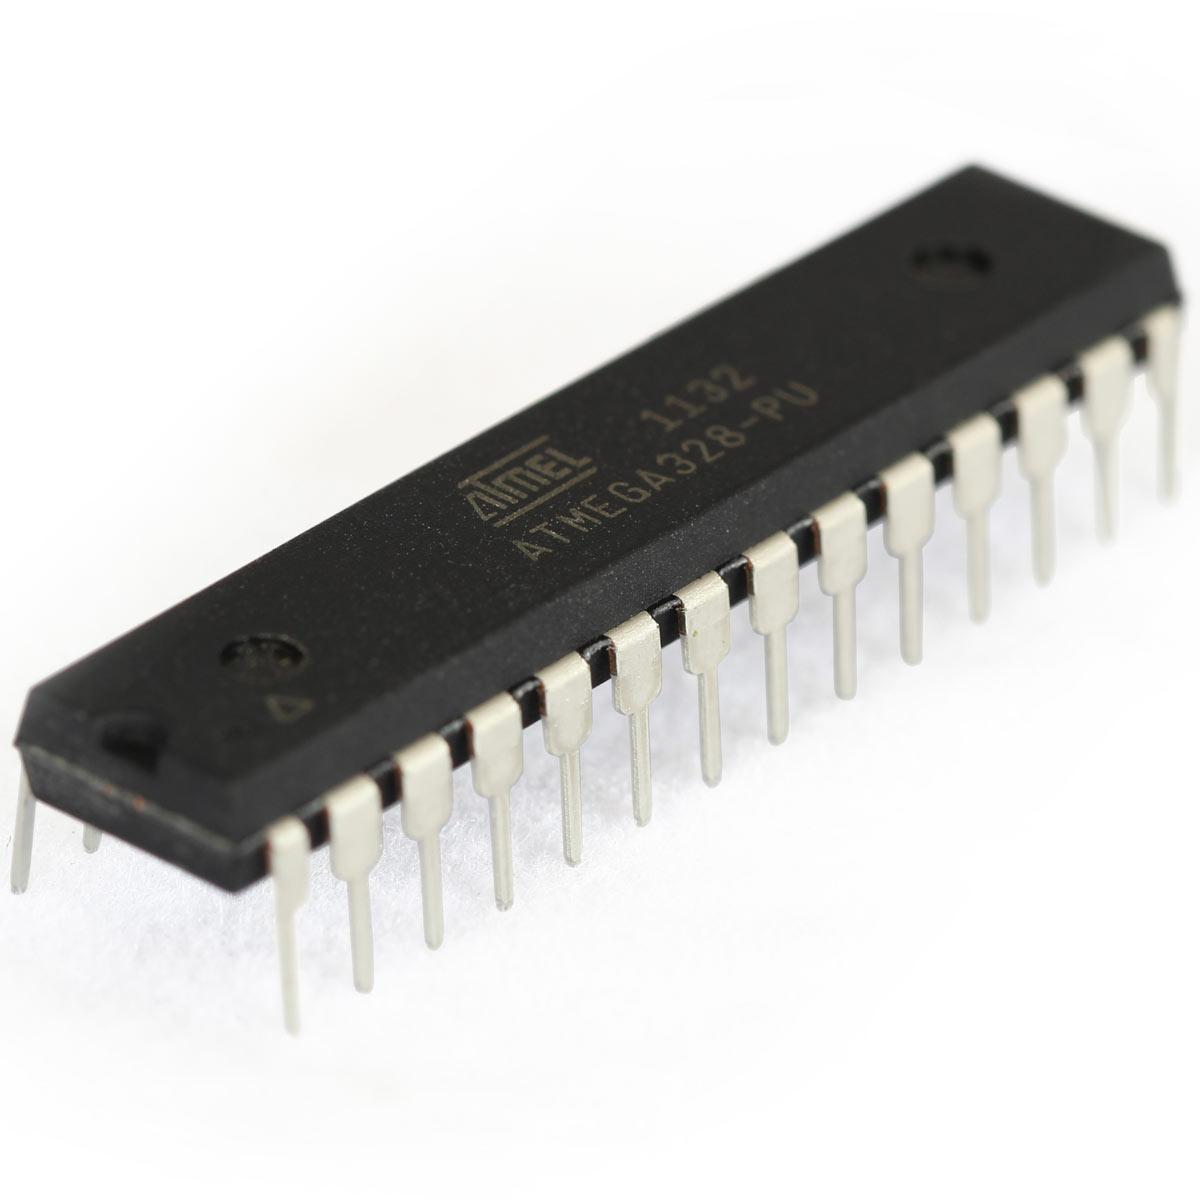 Atmega328p Pu Atmel 8 Bit 32k Avr Microcontroller Protostack Arduino In System Programmer